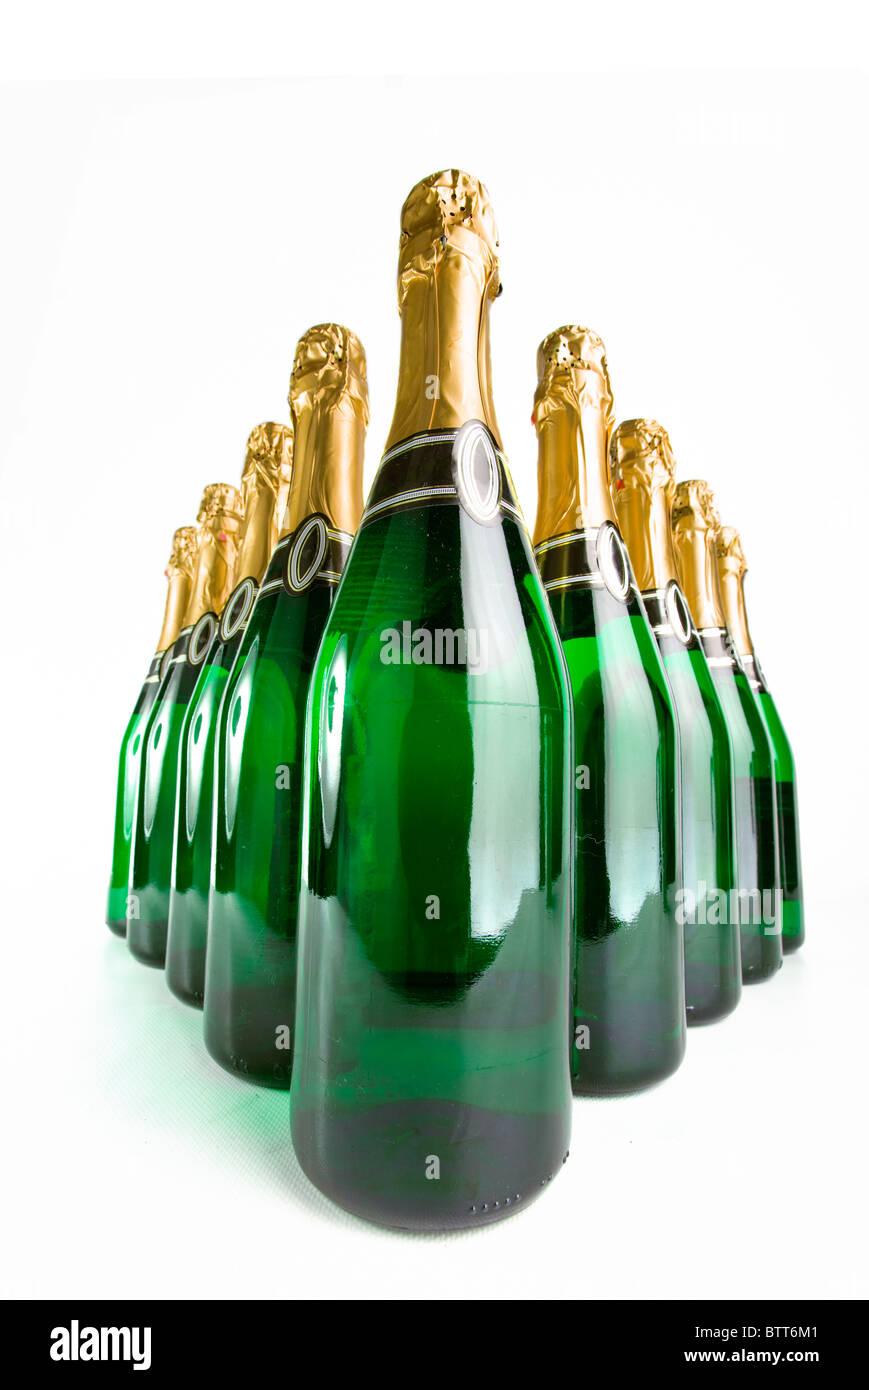 Sparkling wine bottles on a white background - Stock Image